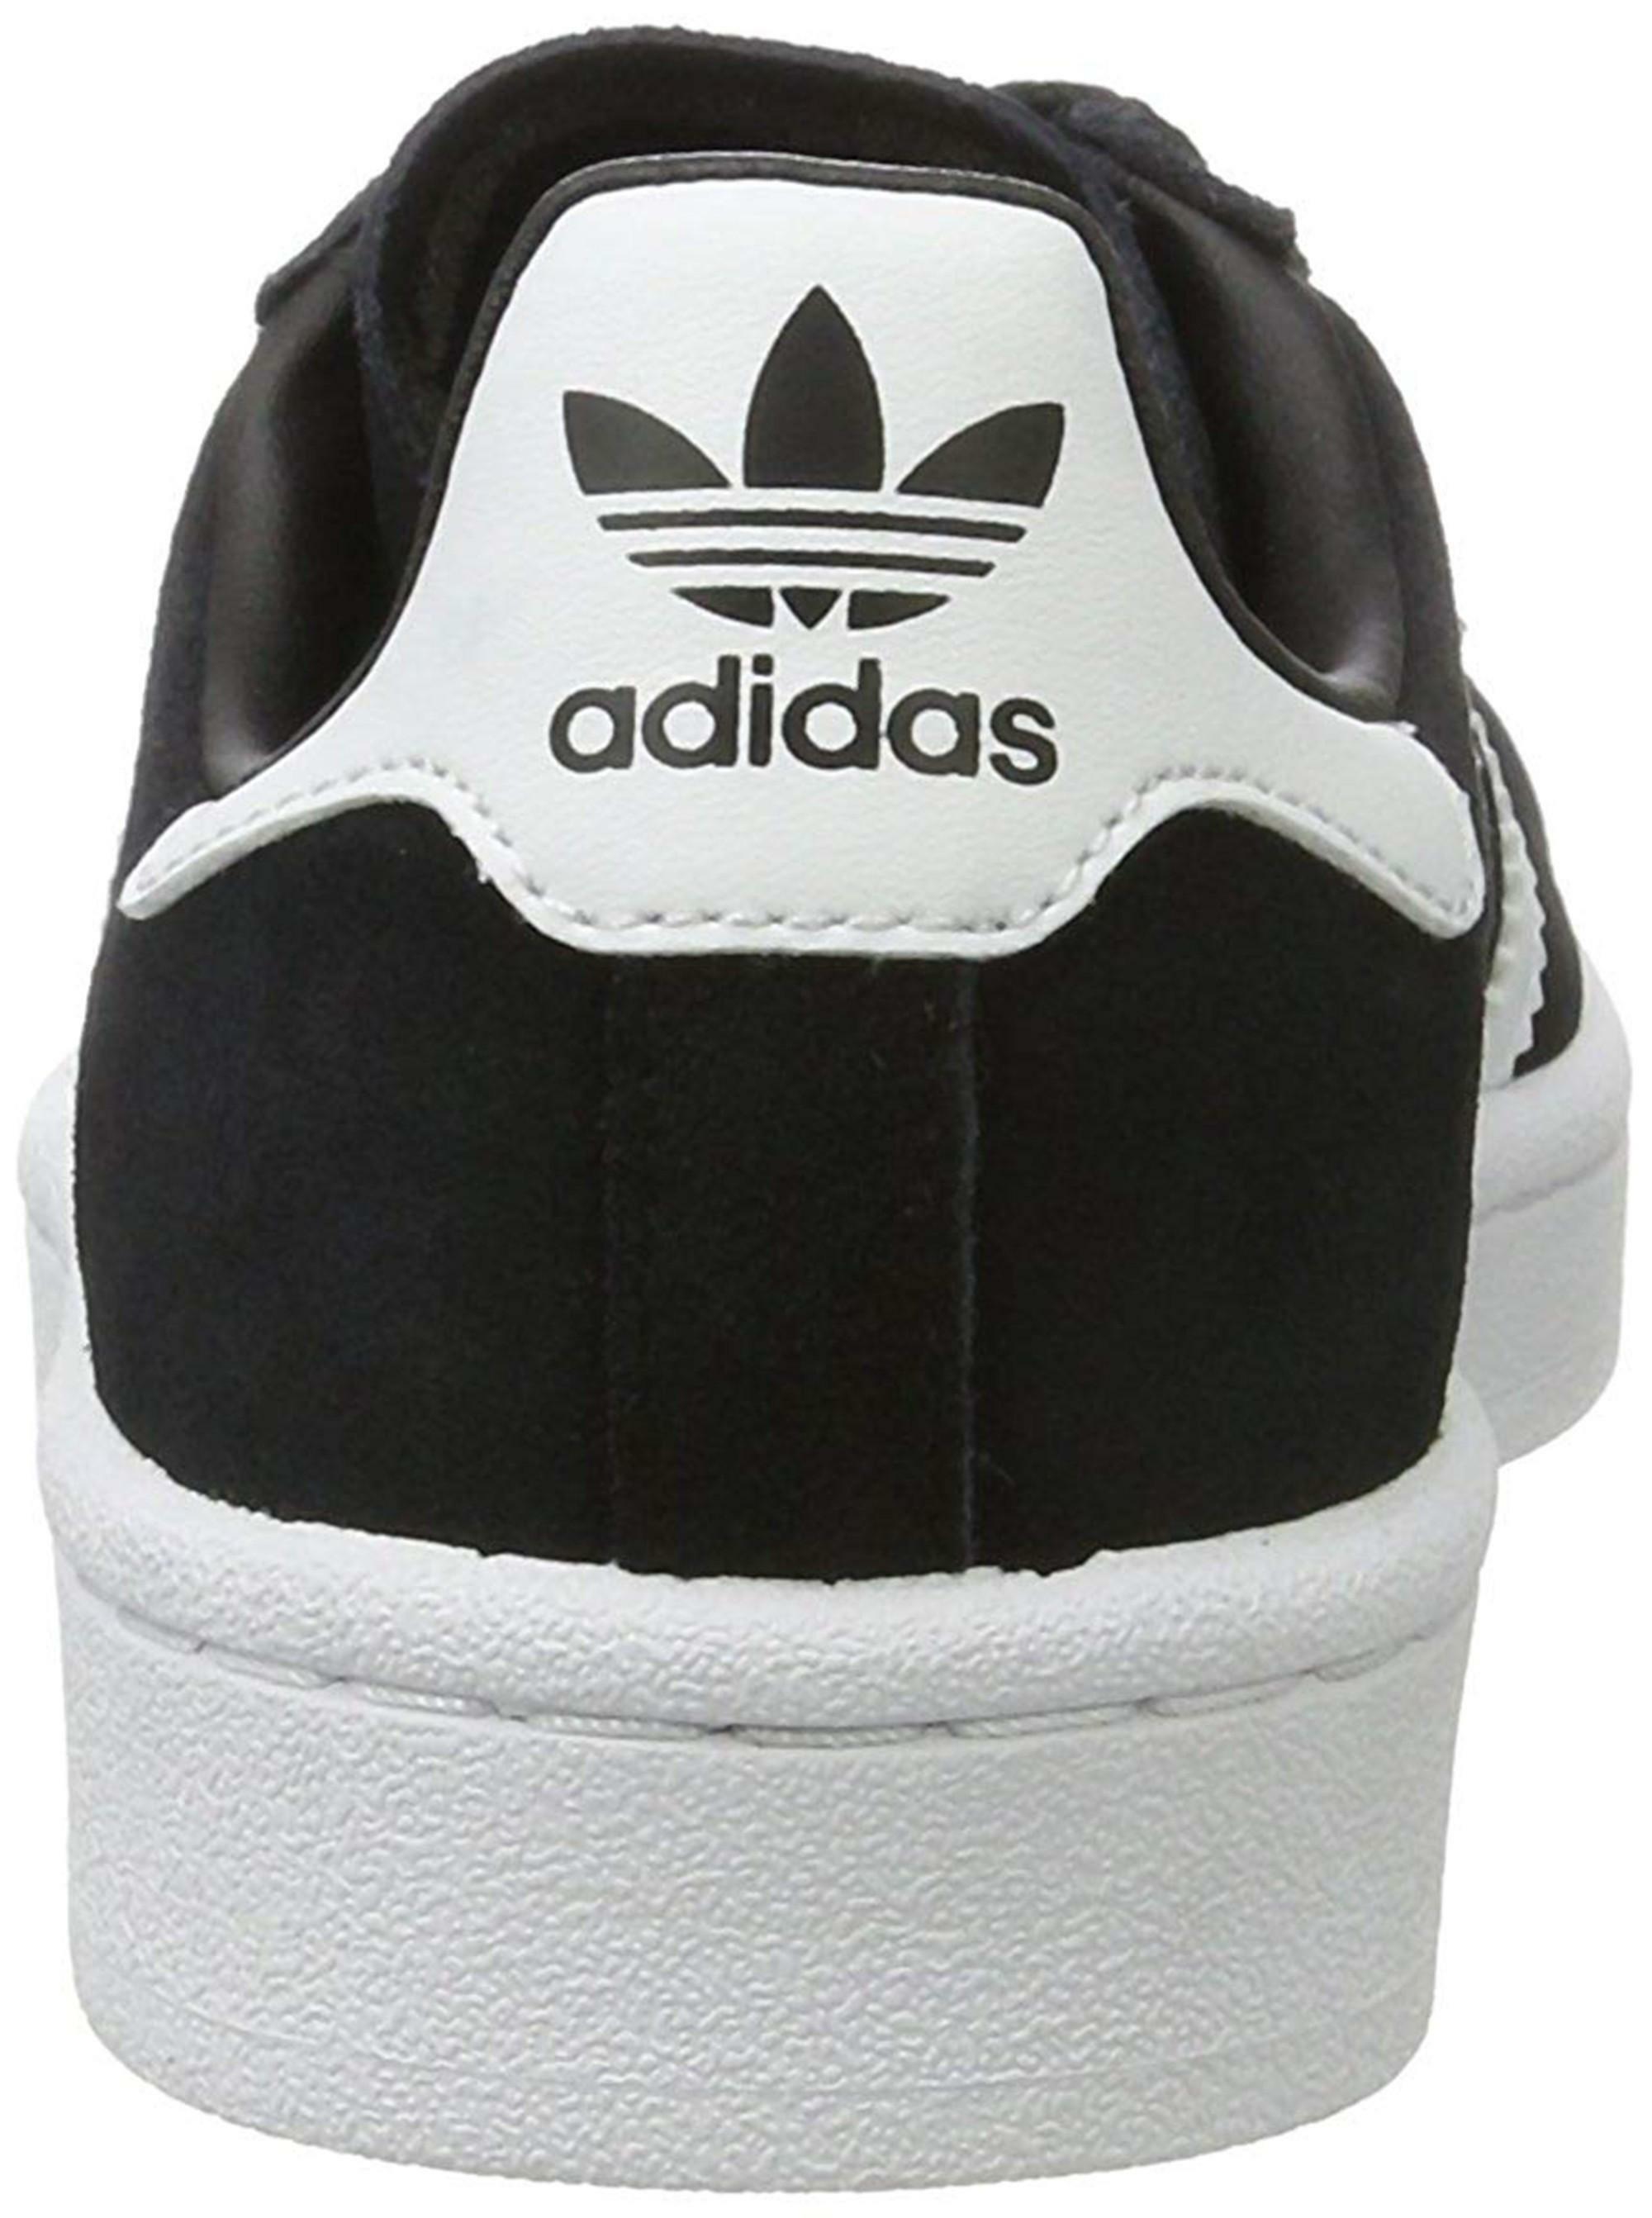 adidas adidas campus j scarpe sportive nere by9580